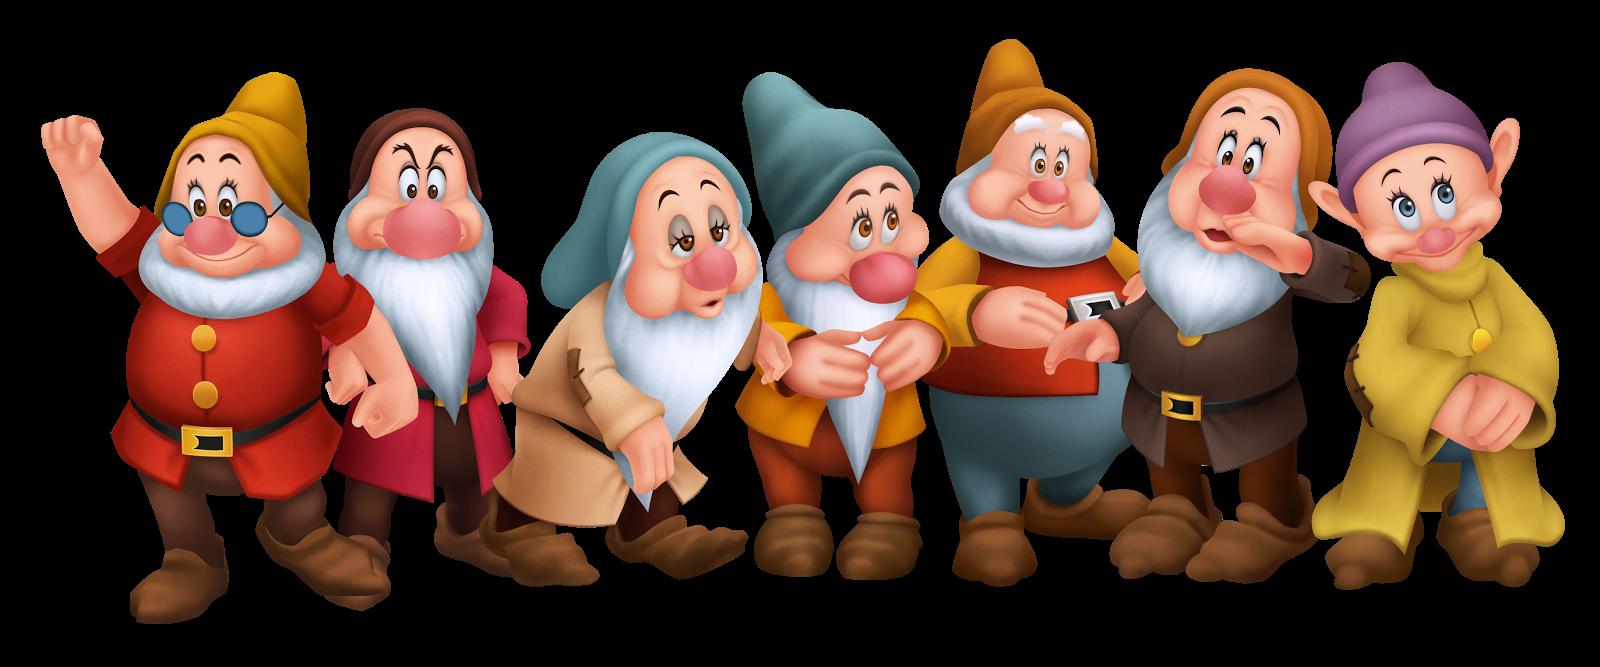 Kingdom Hearts Dwarfs.png (1600×667) | Quotes u0026 posts | Pinterest | Dwarf,  Snow white and Snow - 7 Dwarfs PNG